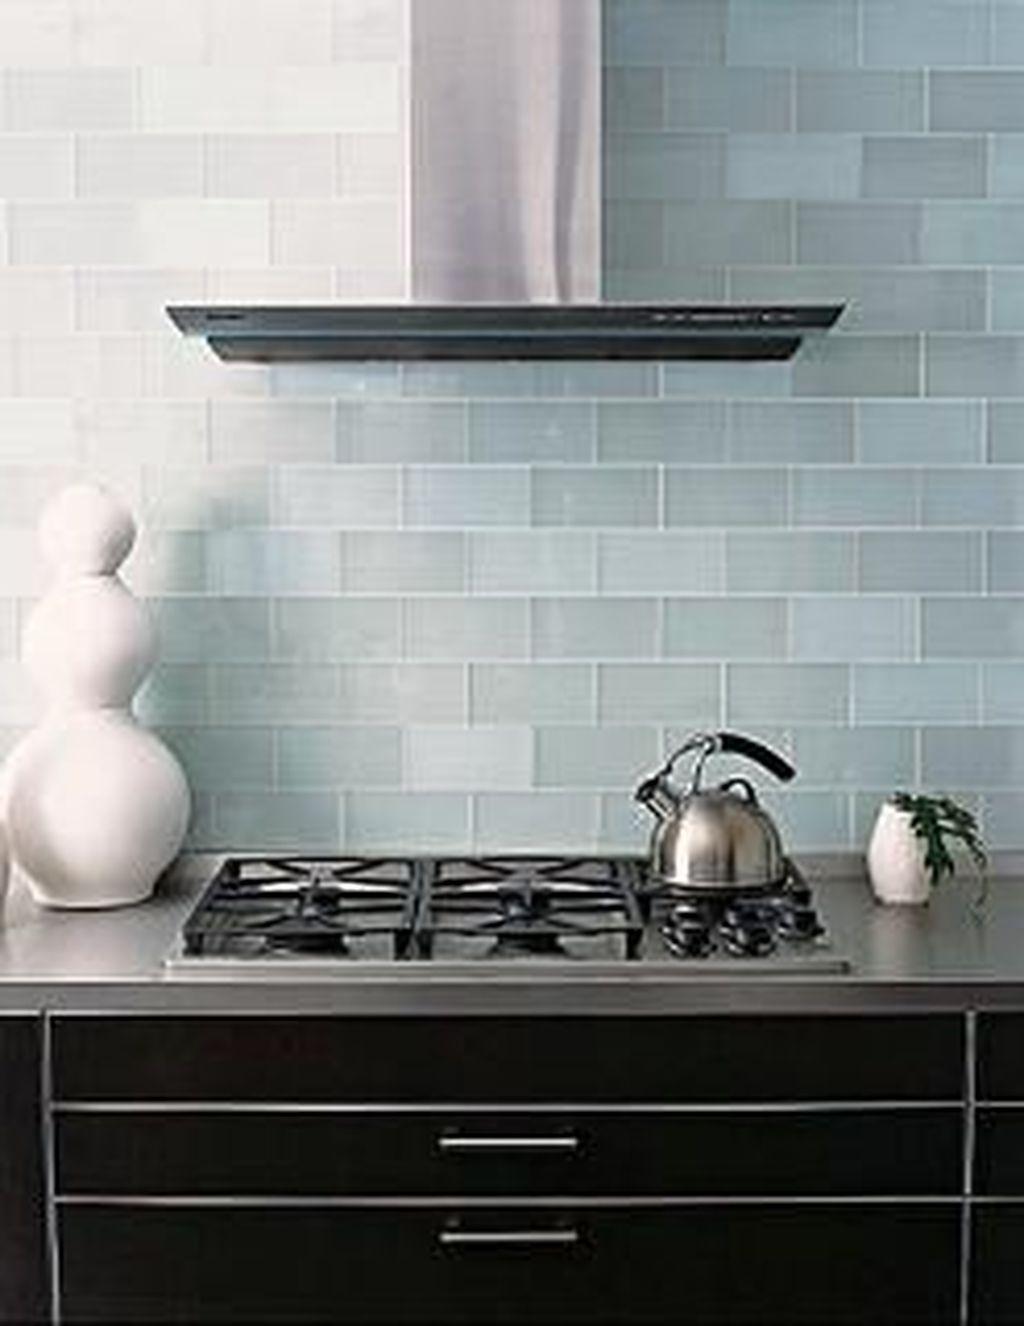 Stunning Glass Backsplash Kitchen Ideas 21